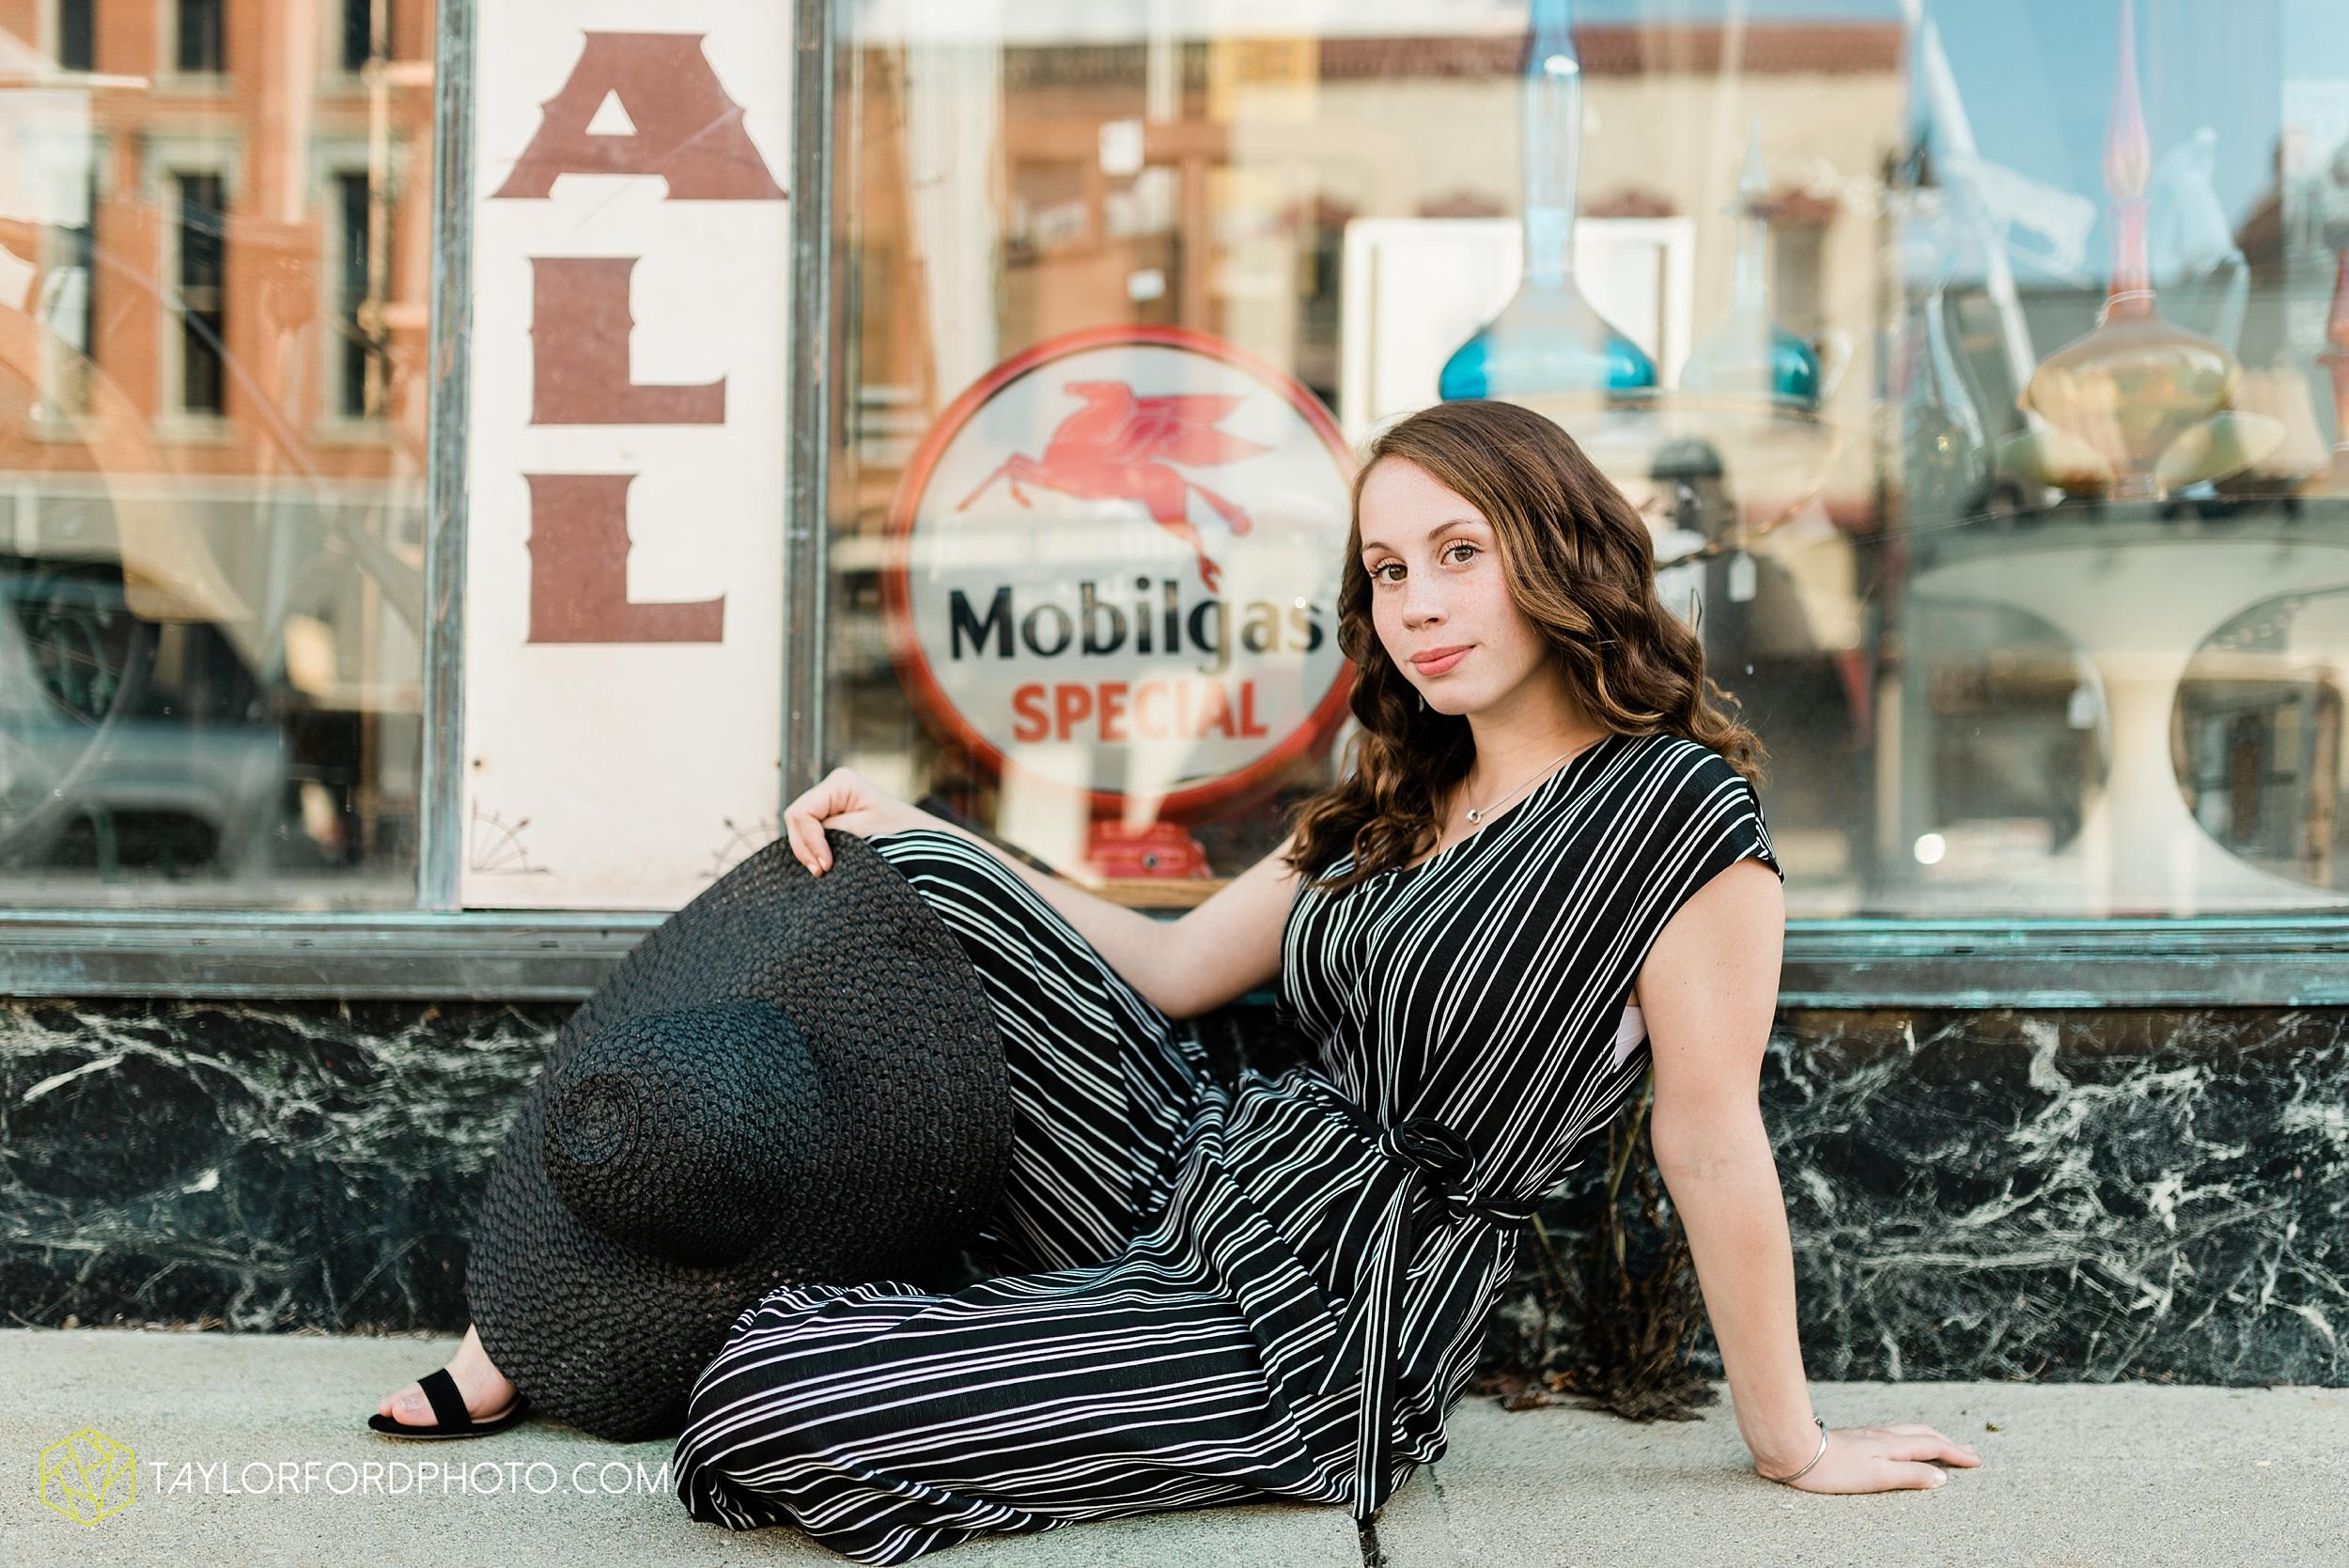 van-wert-high-school-ohio-senior-girl-downtown-cougar-photographer-taylor-ford-photography_0923.jpg